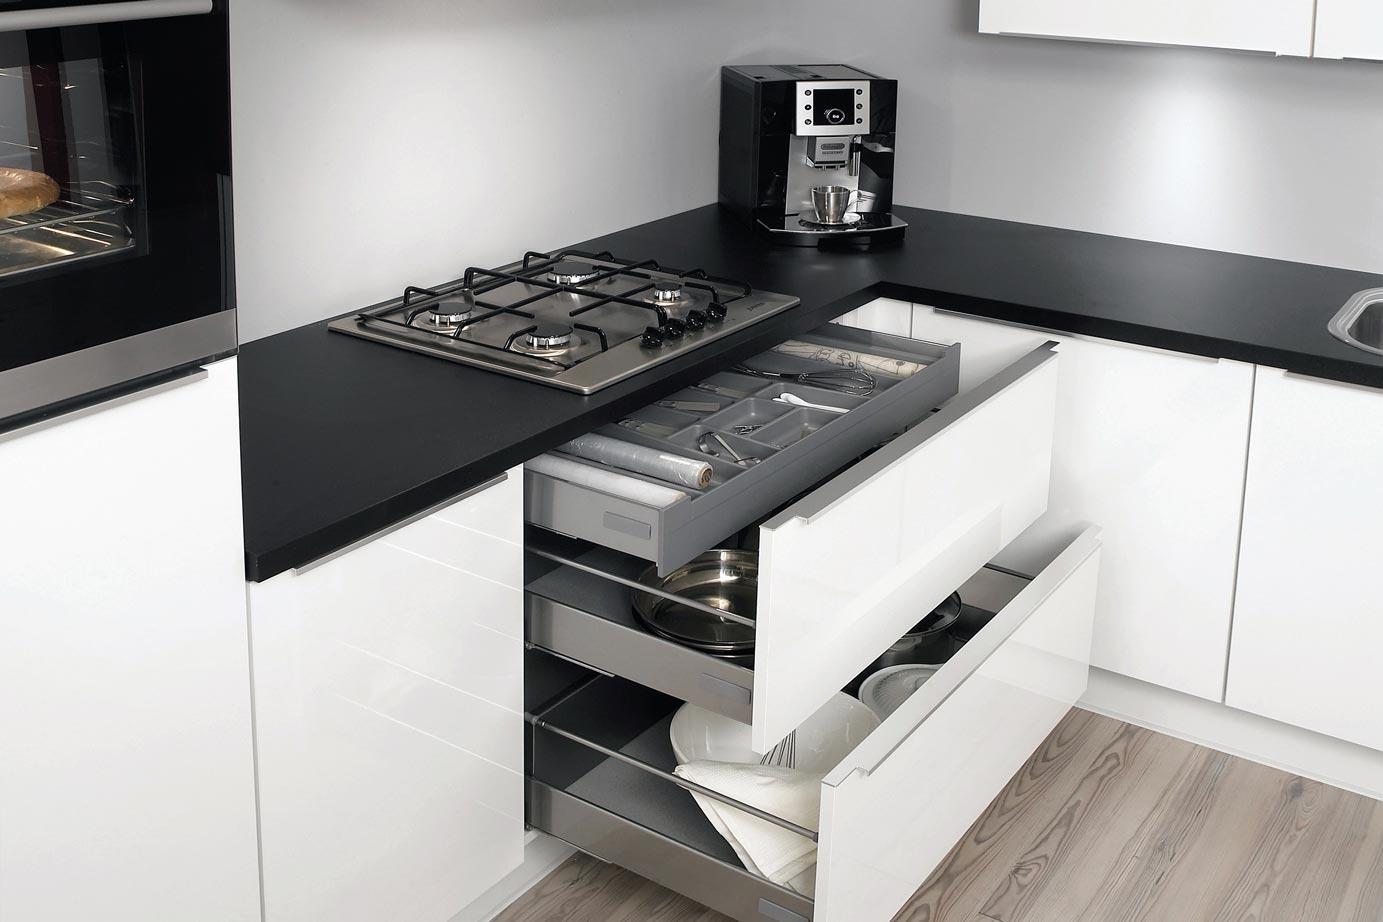 Keuken ontwerpen informatie die u vooraf moet weten db keukens